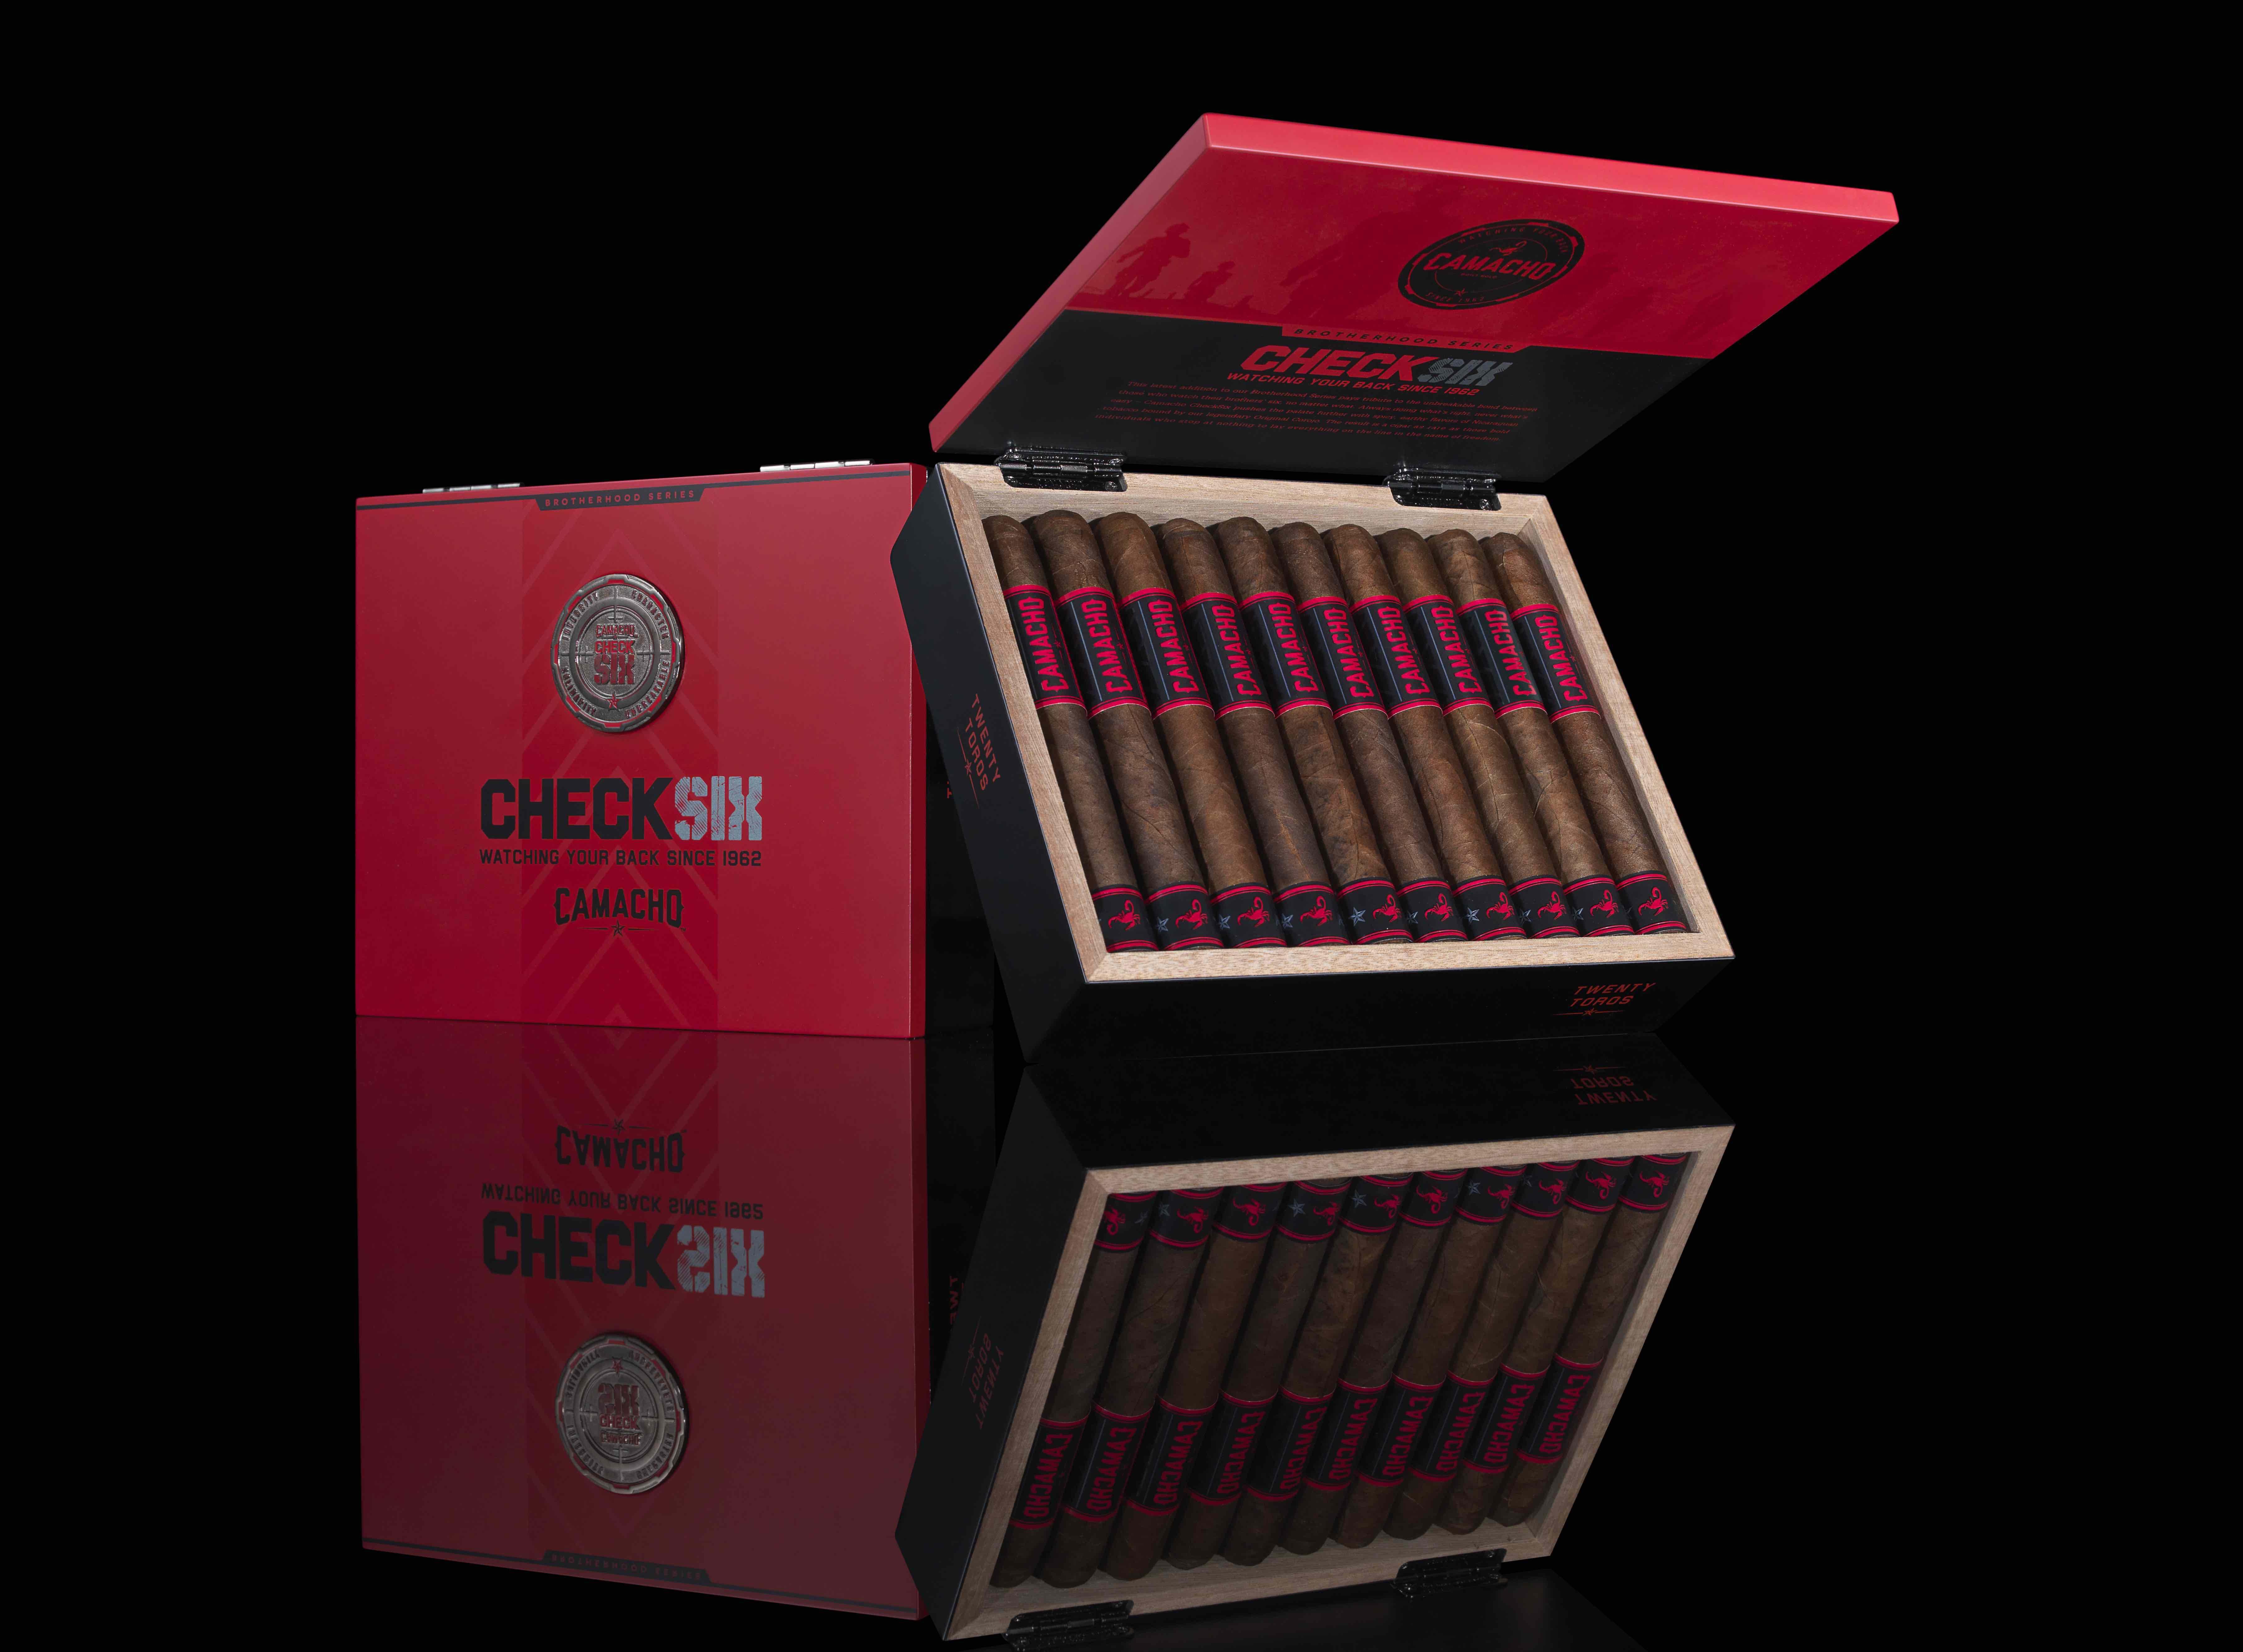 Camacho_Check_Six_Box